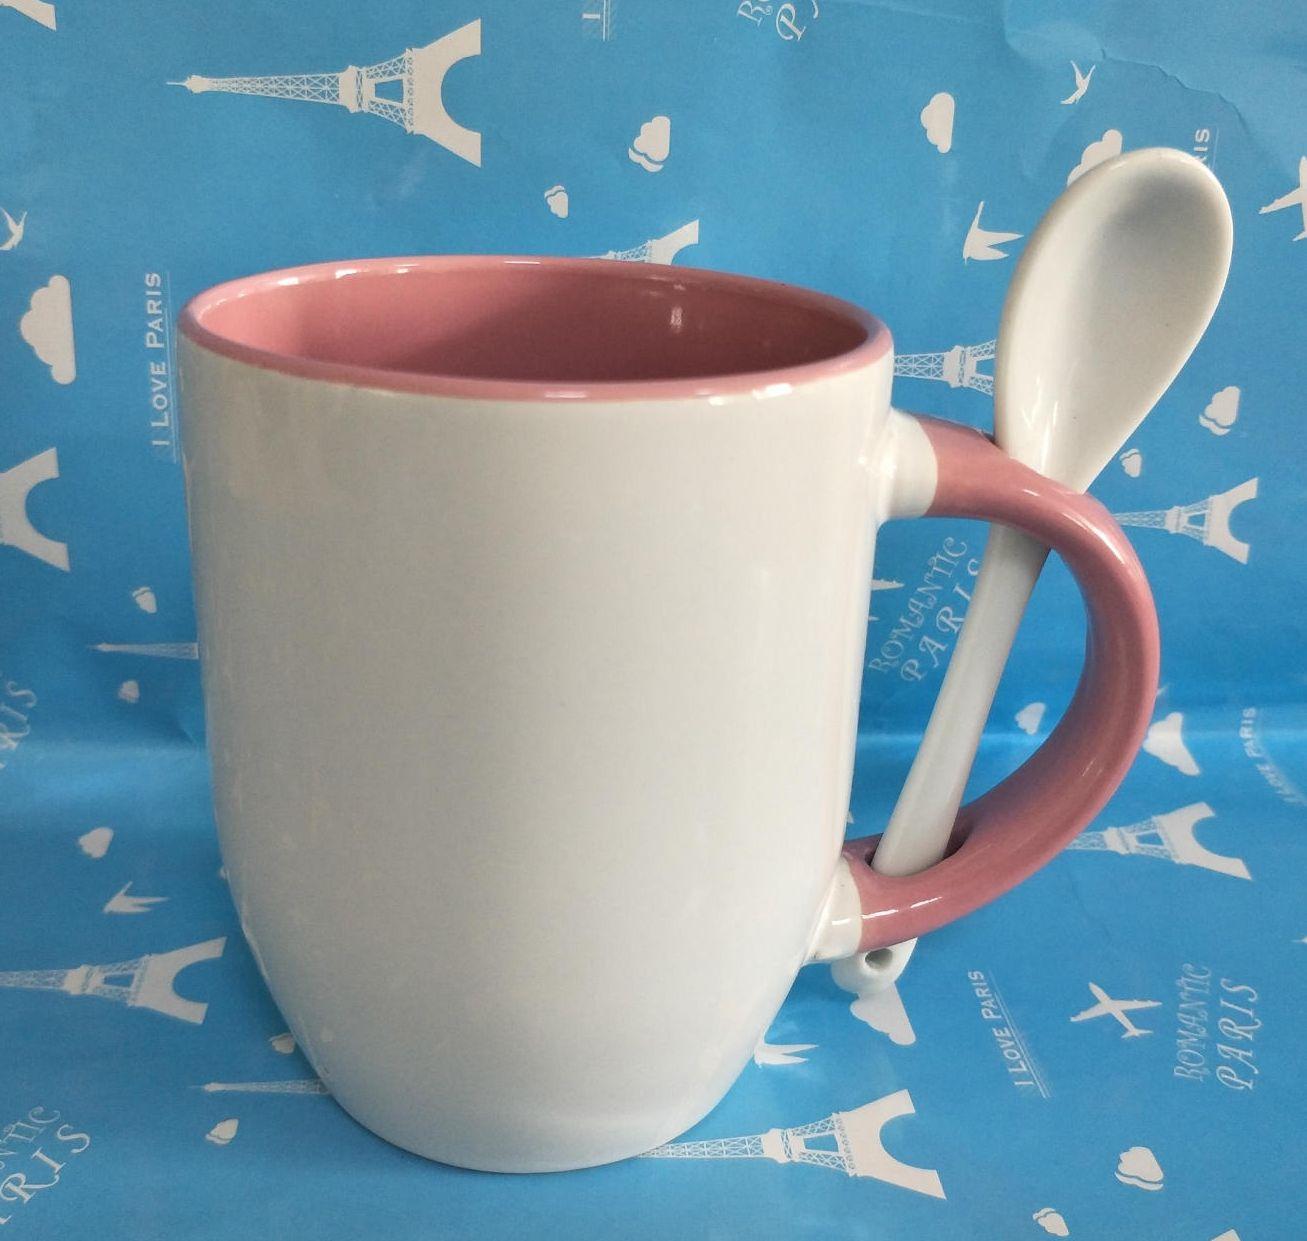 custom-pink-mug-with-spoon.jpg